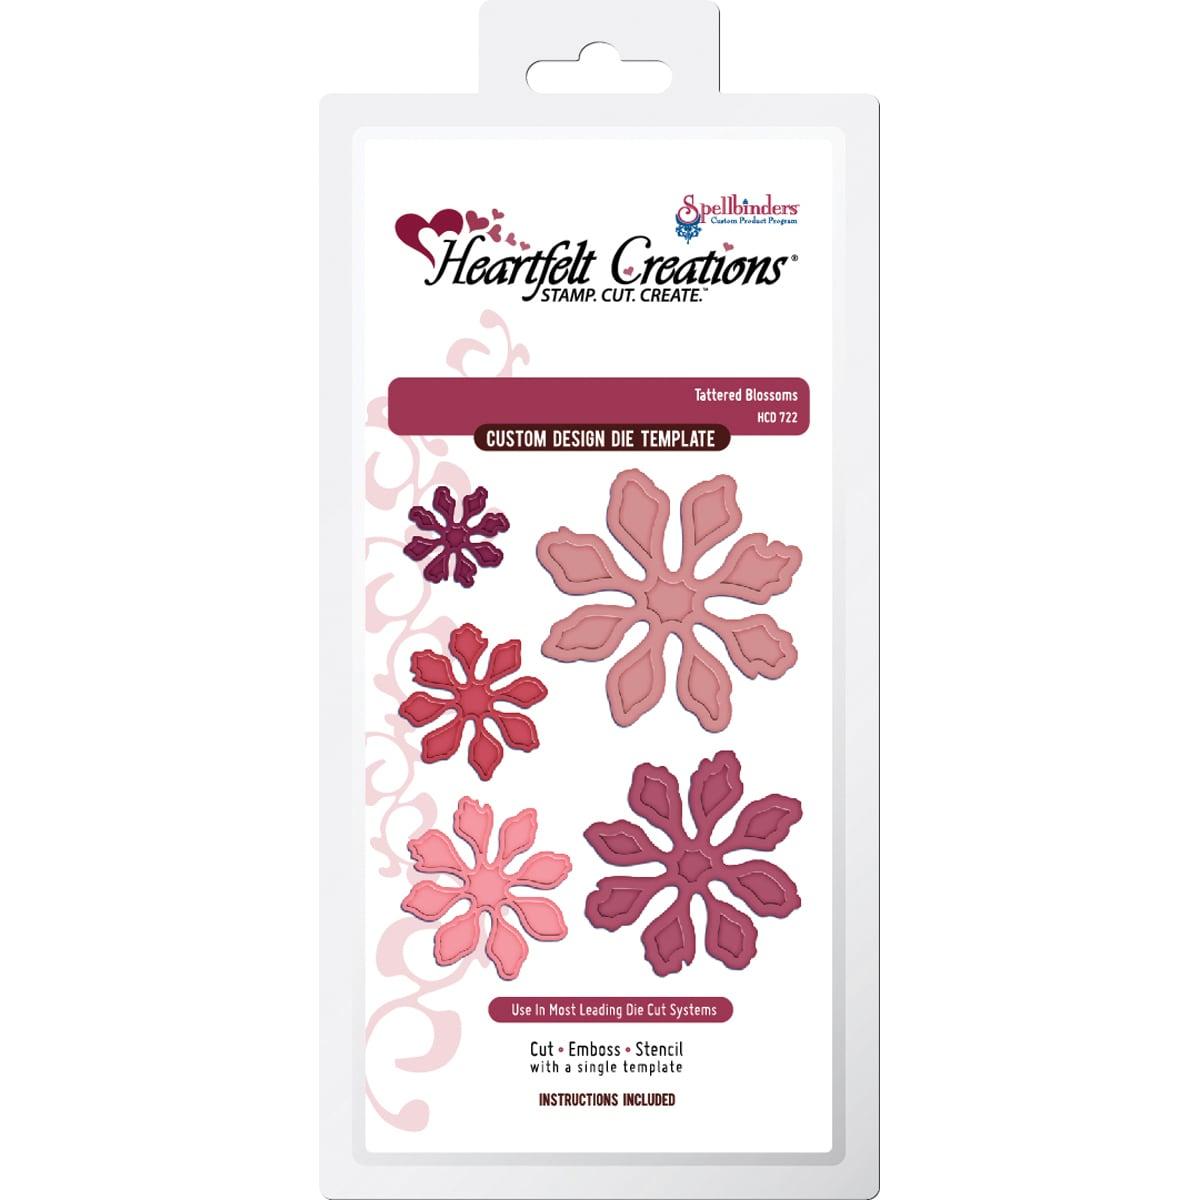 Heartfelt Creations Cut & Emboss Dies By Spellbinder's-Tattered Blossoms